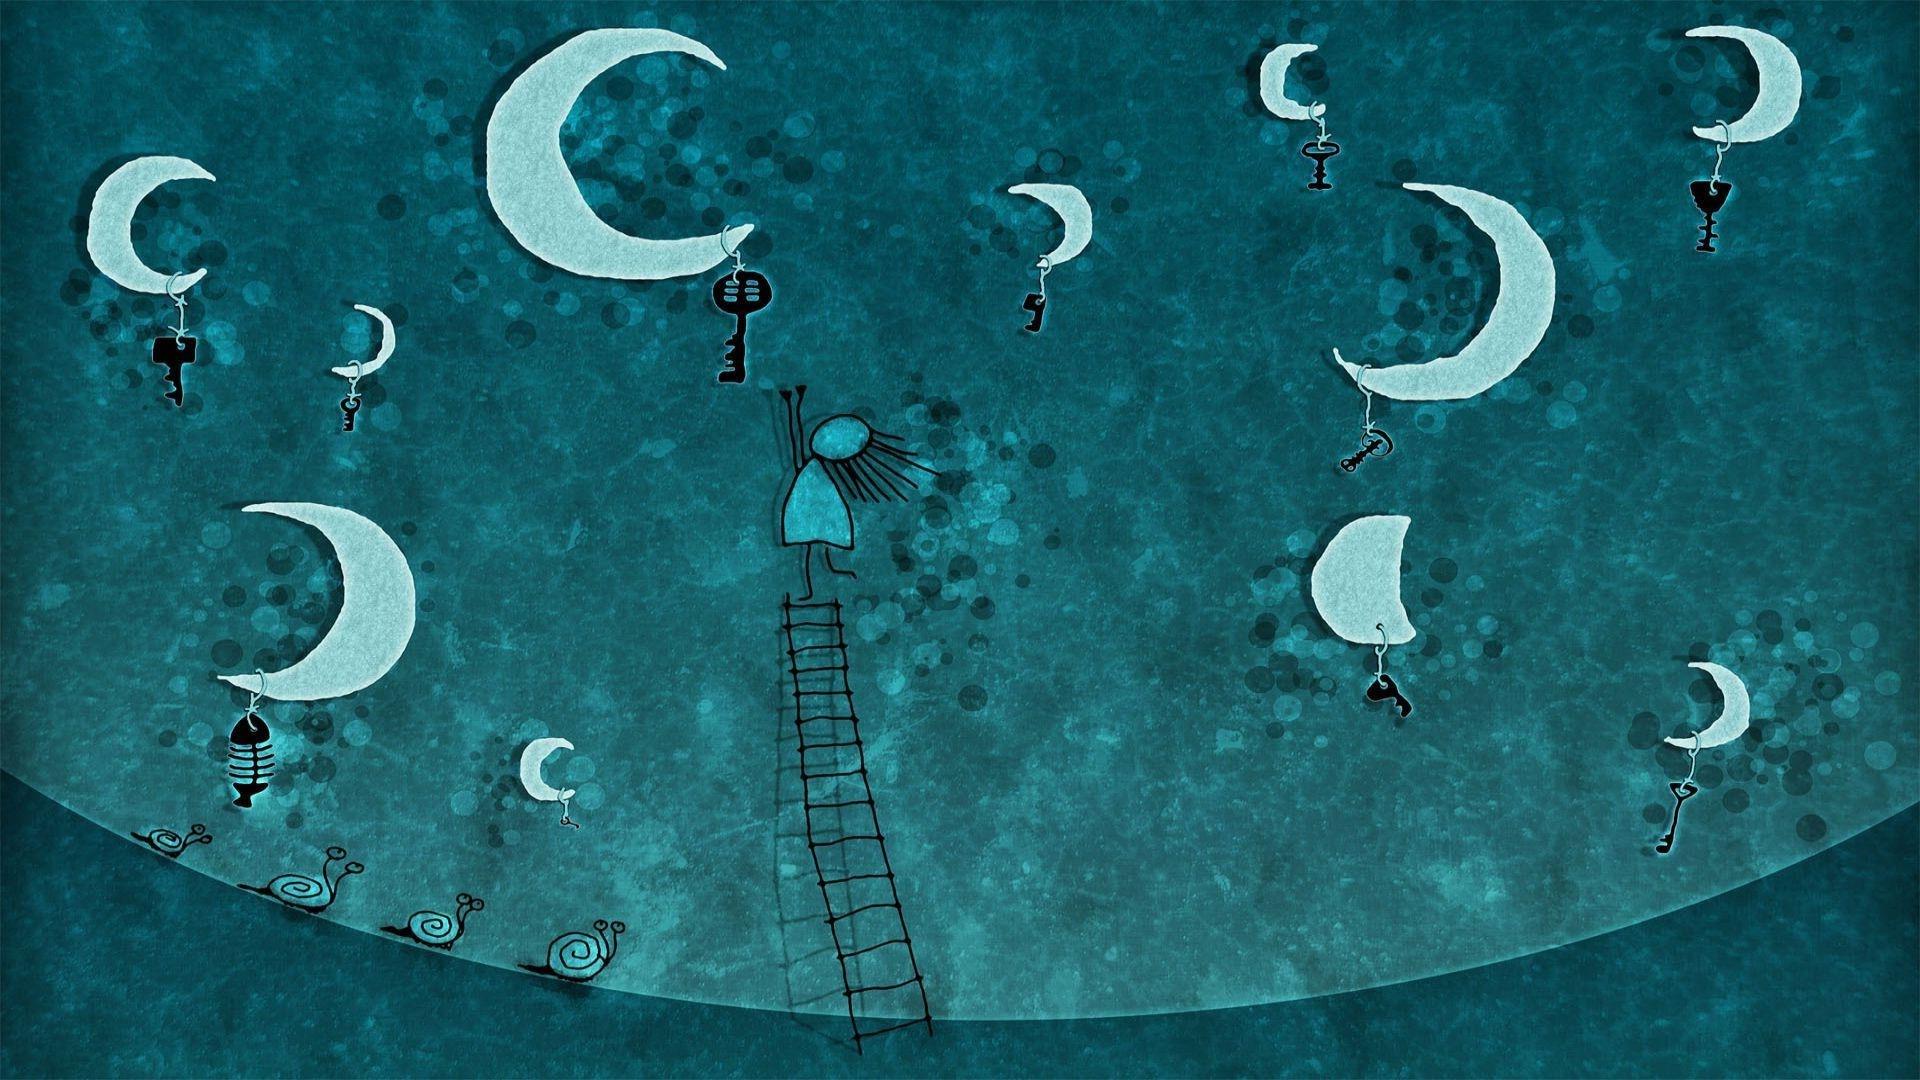 good-night-animated-design-sky-wallpapers